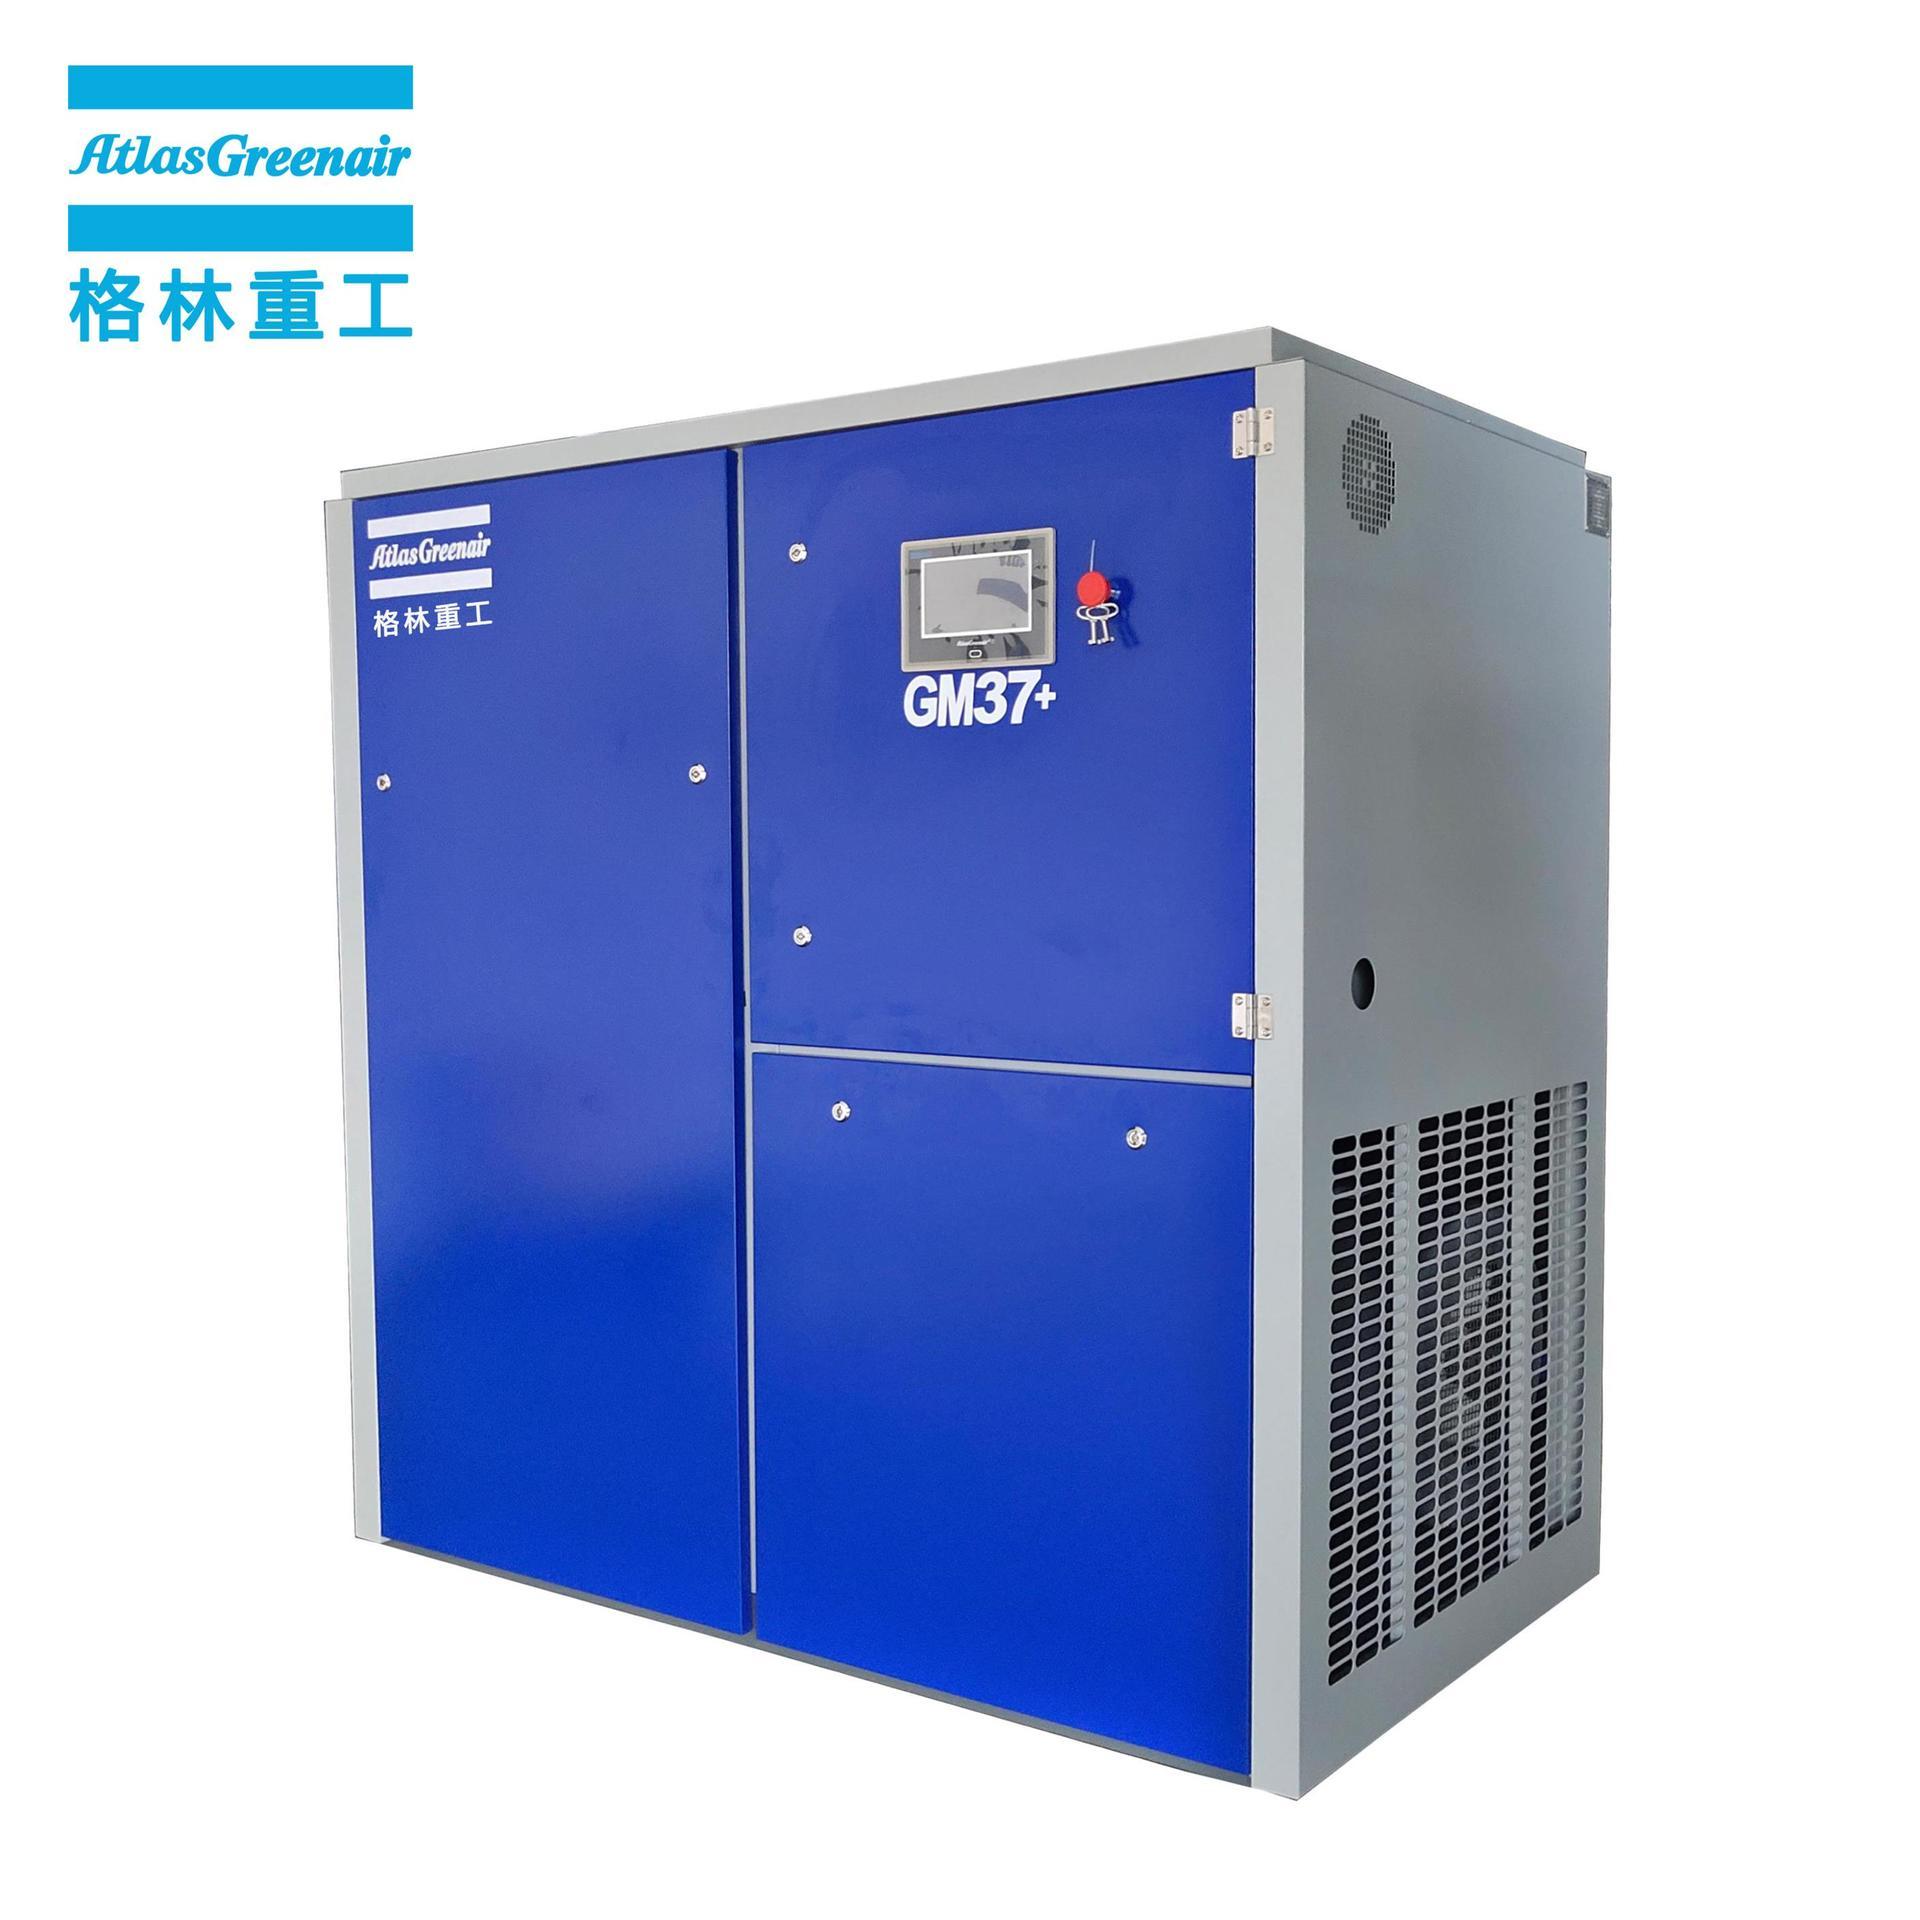 Atlas Greenair GM37+ Two Stage Permanent Magnet VSD Screw Air Compressor